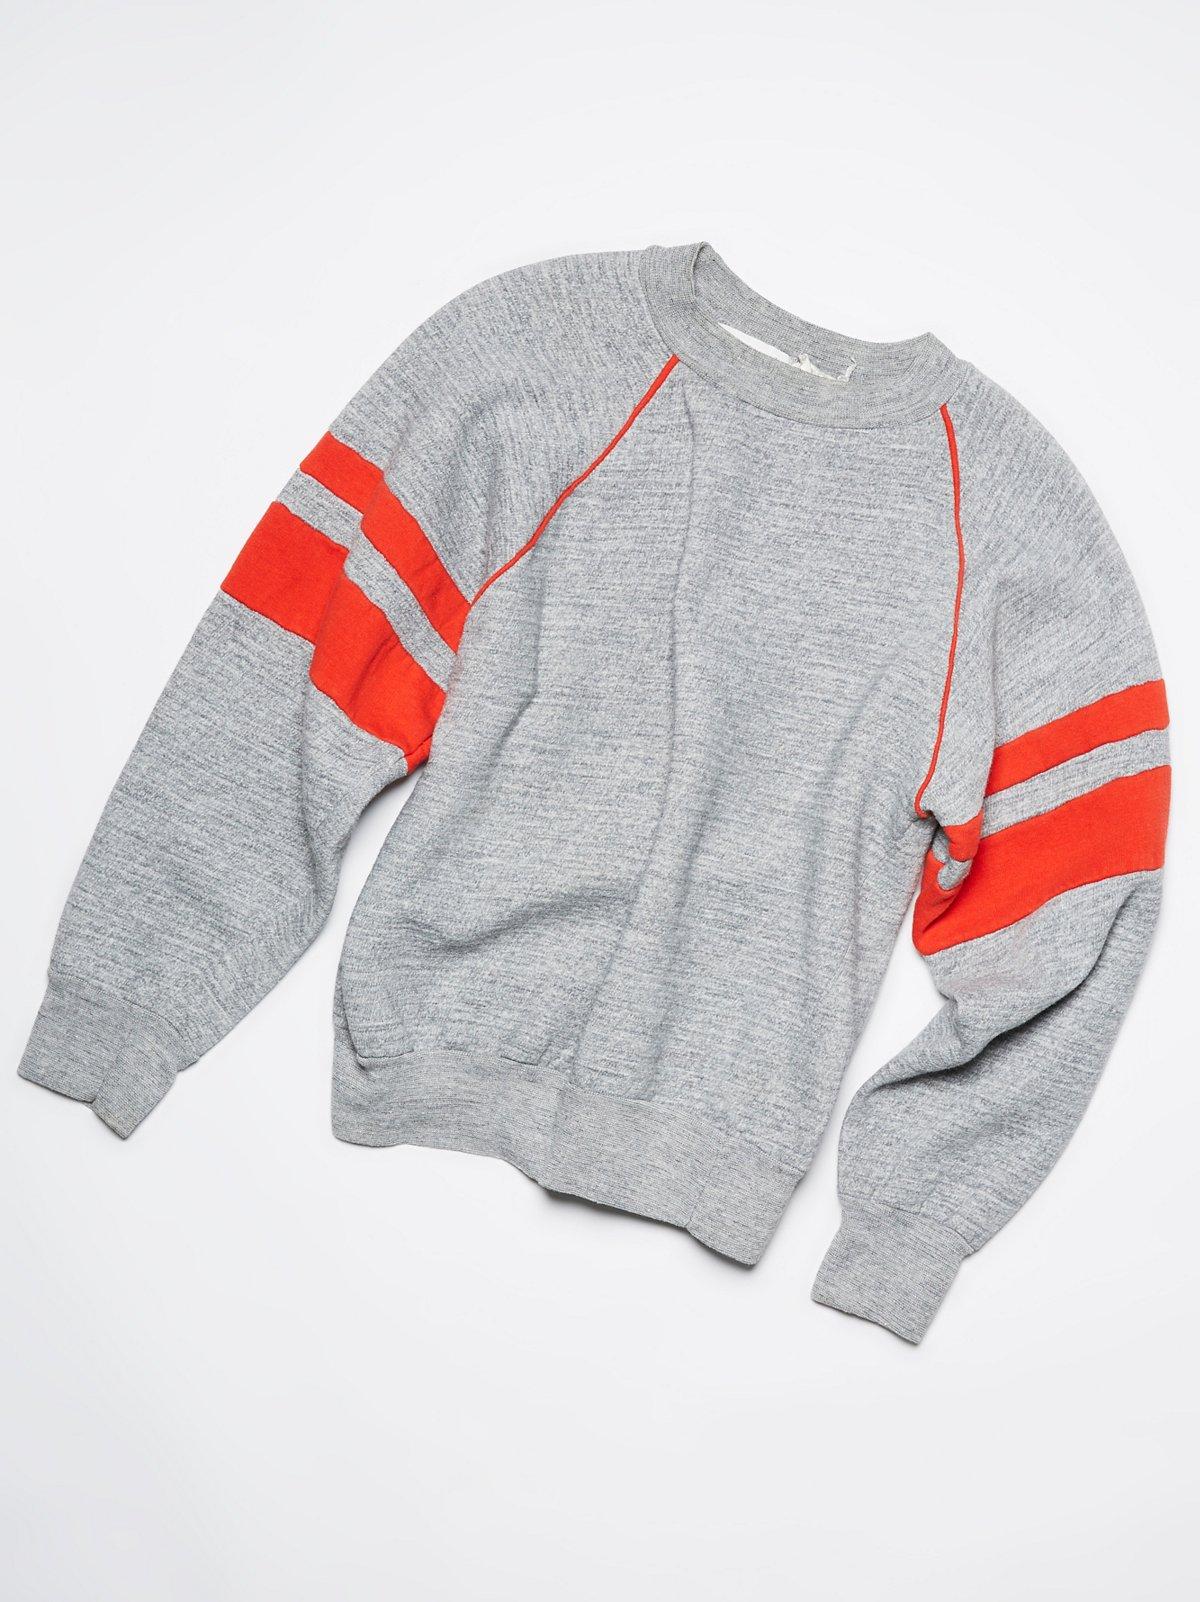 Vintage 1980s Pullover Sweatshirt